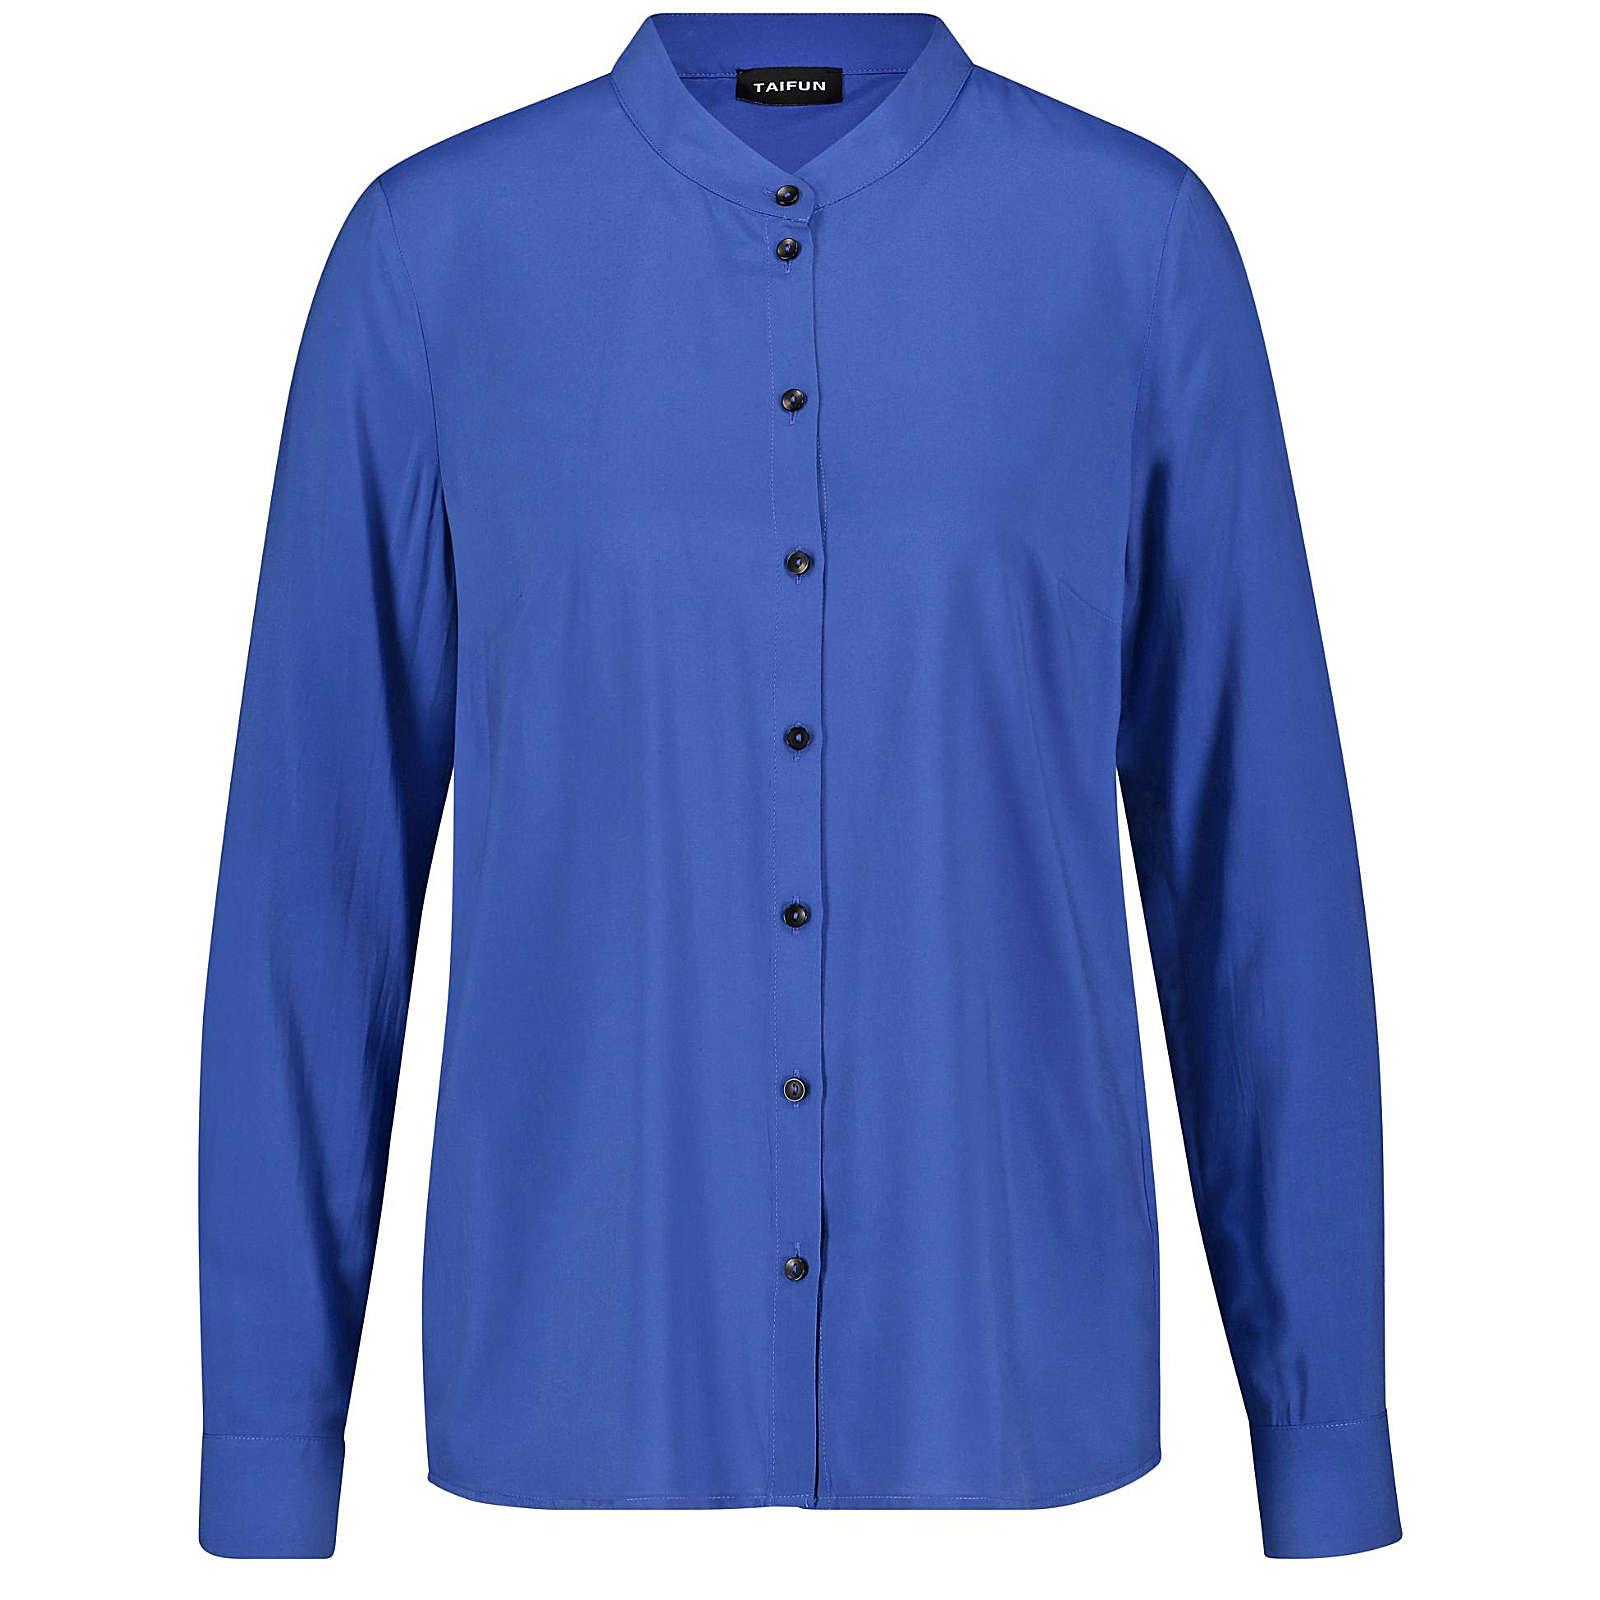 Taifun Bluse Langarm Klassische Bluse blau Damen Gr. 44